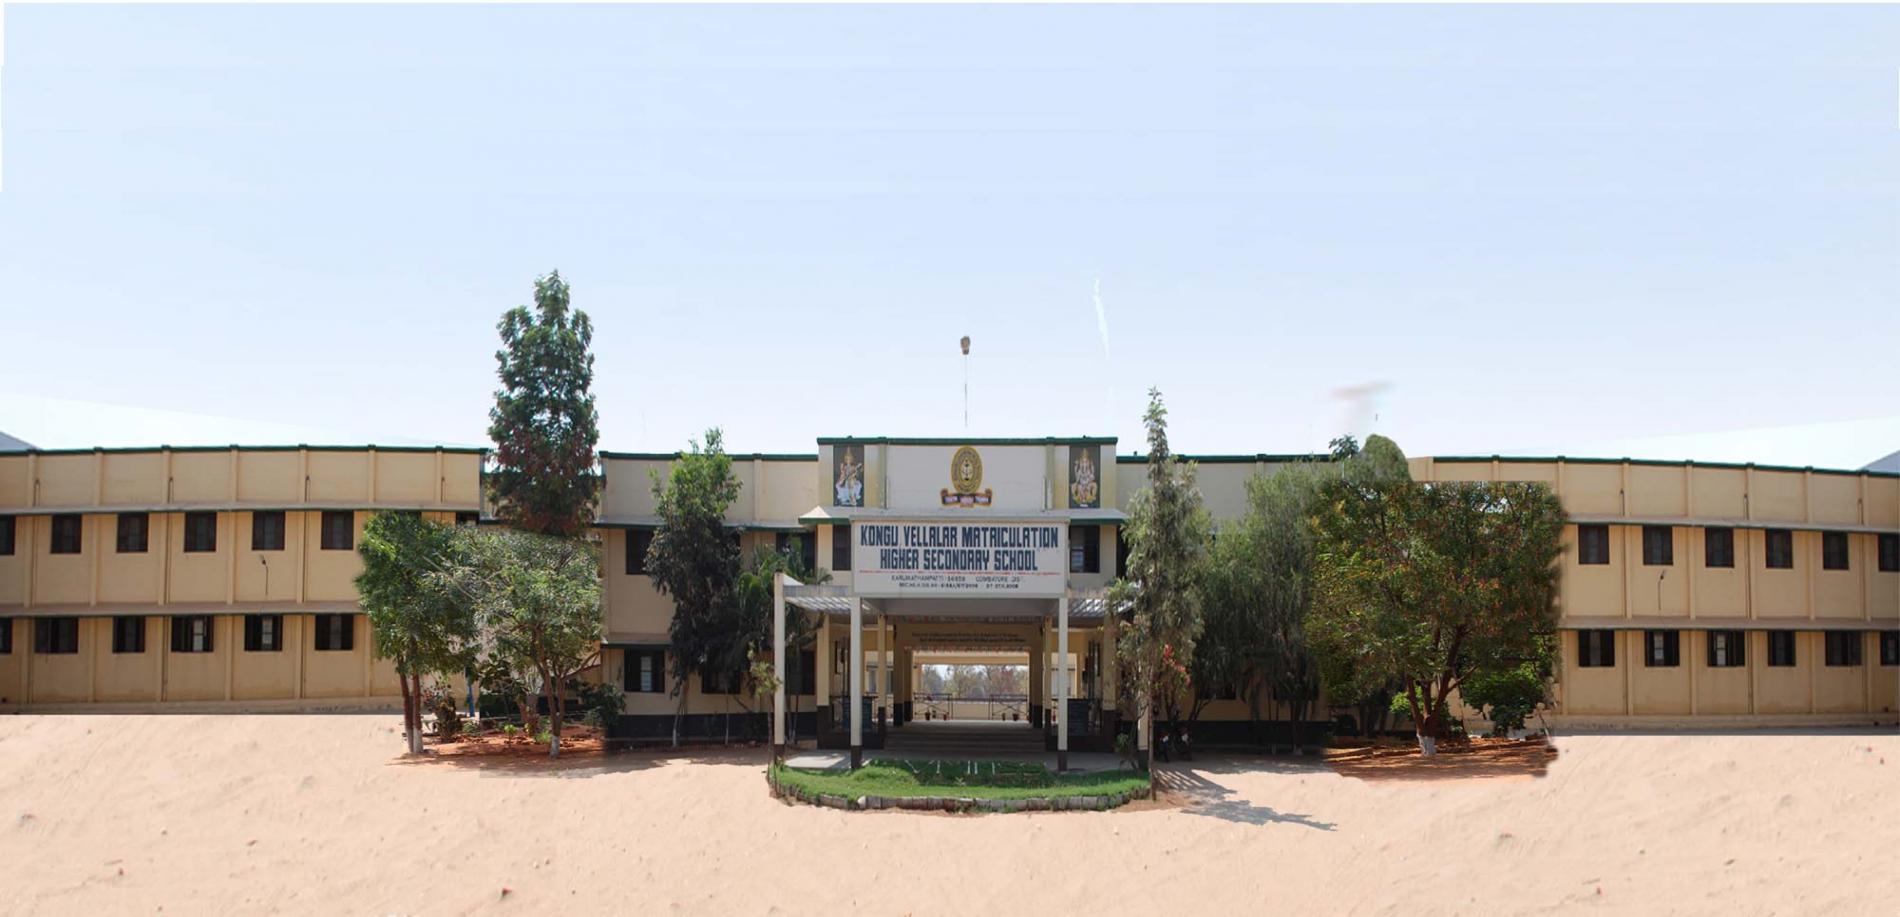 Kongu vellalar Matric Higher Secondary School